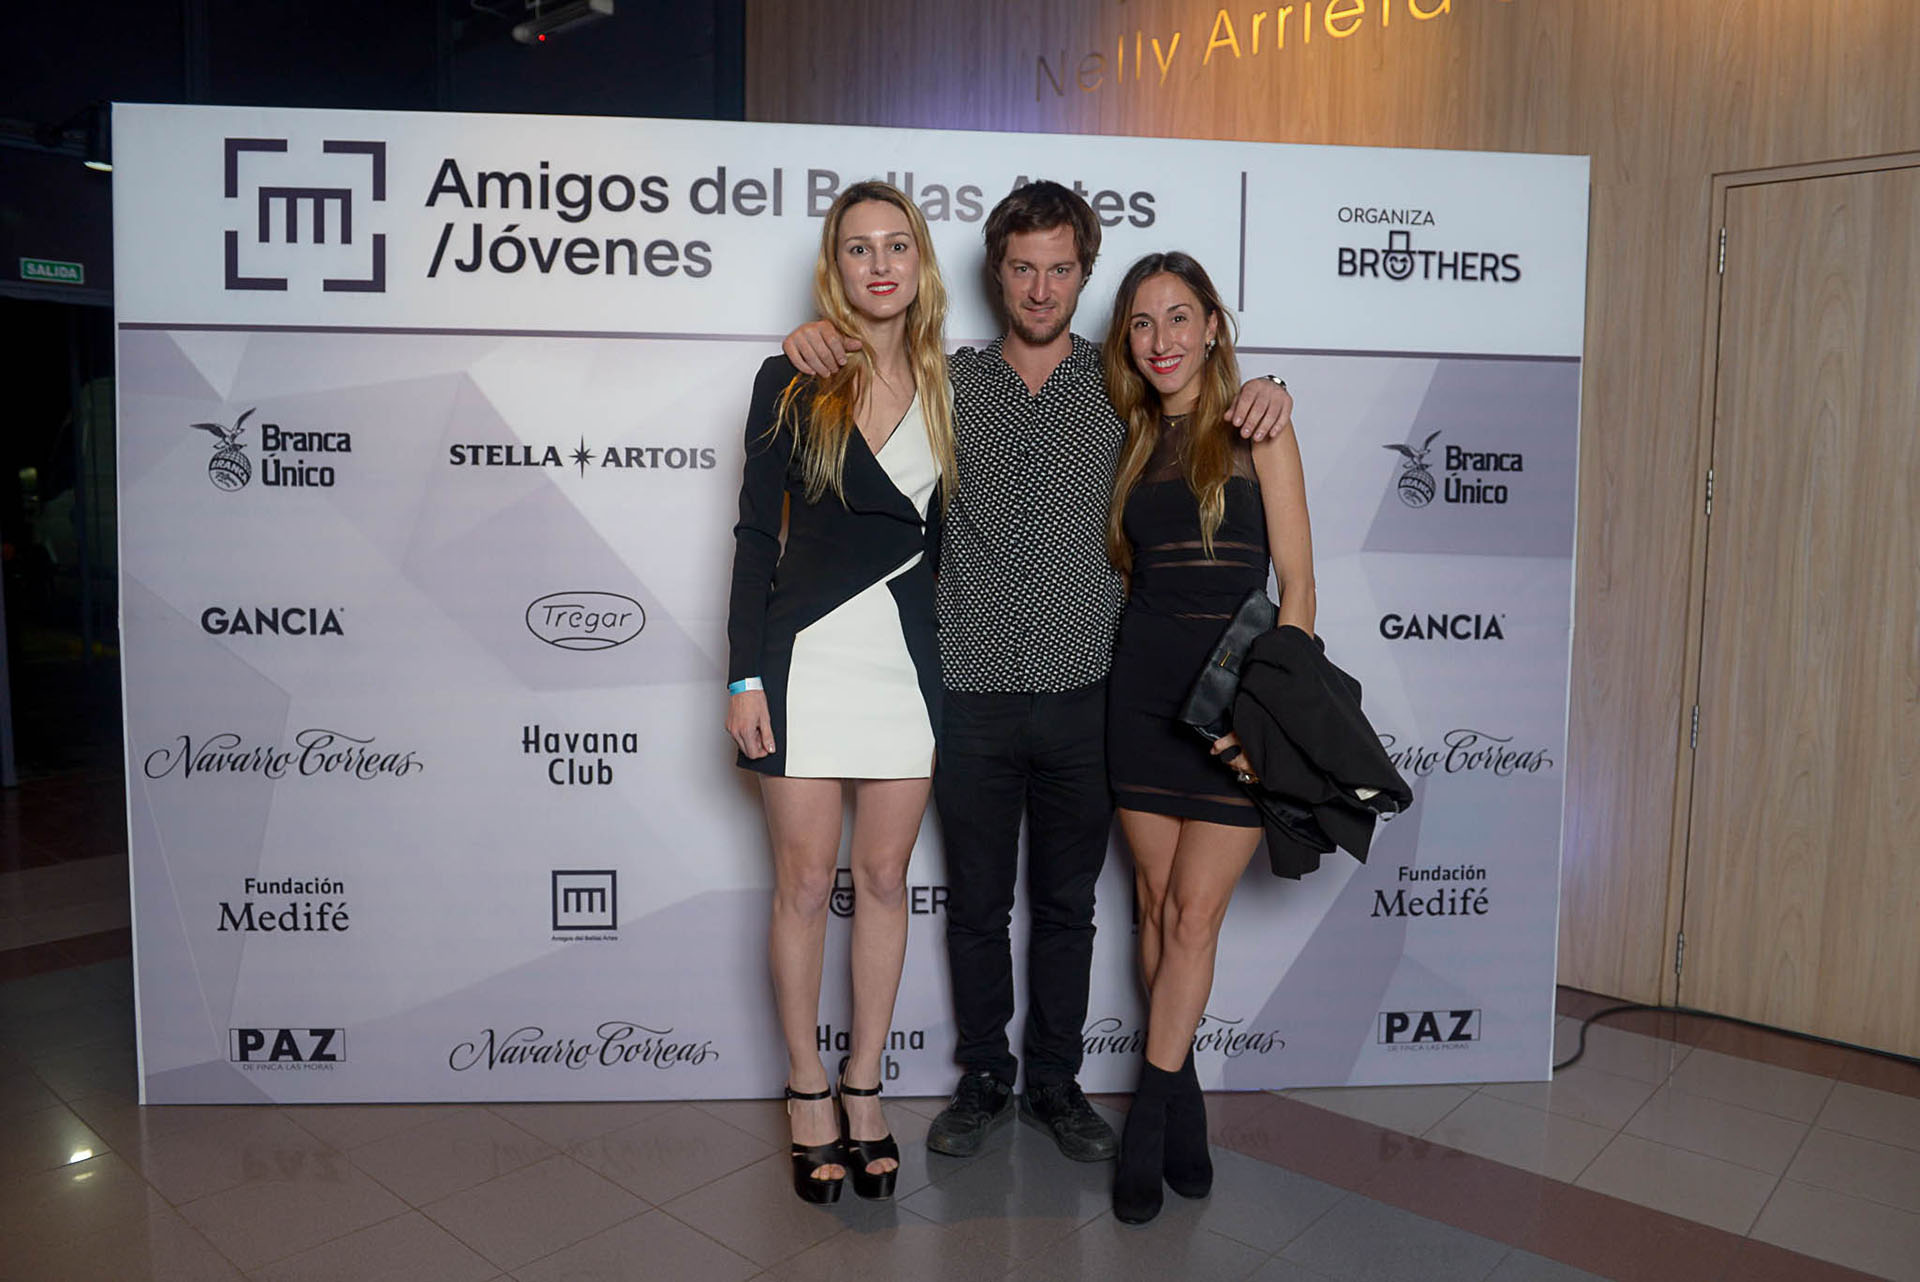 Nieves Zuberbuhler, Santiago Tanoira e Isabel Tassara